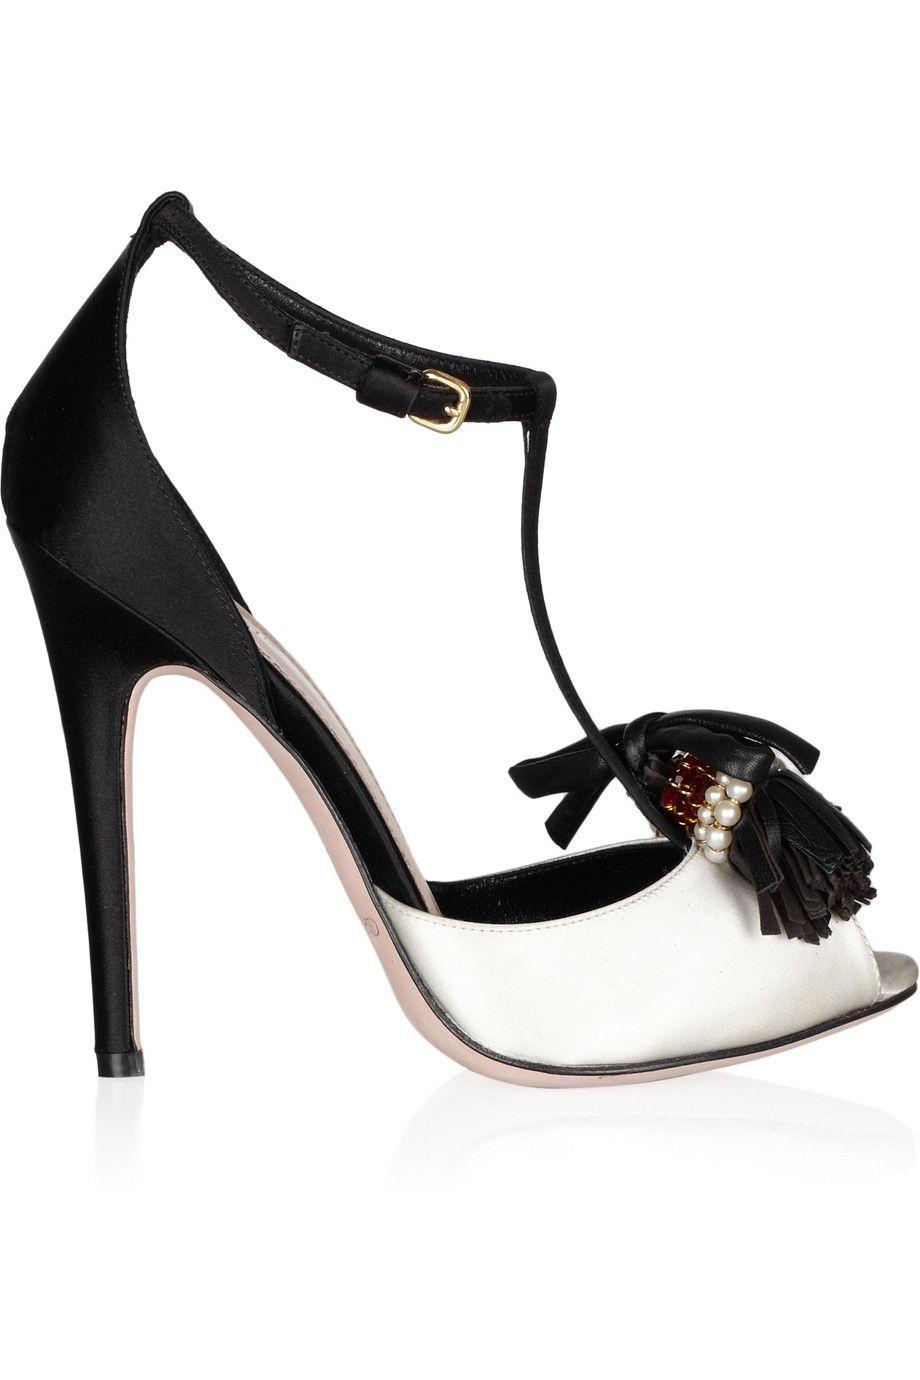 Embellished satin peep-toe sandals by Giambattista Valli.